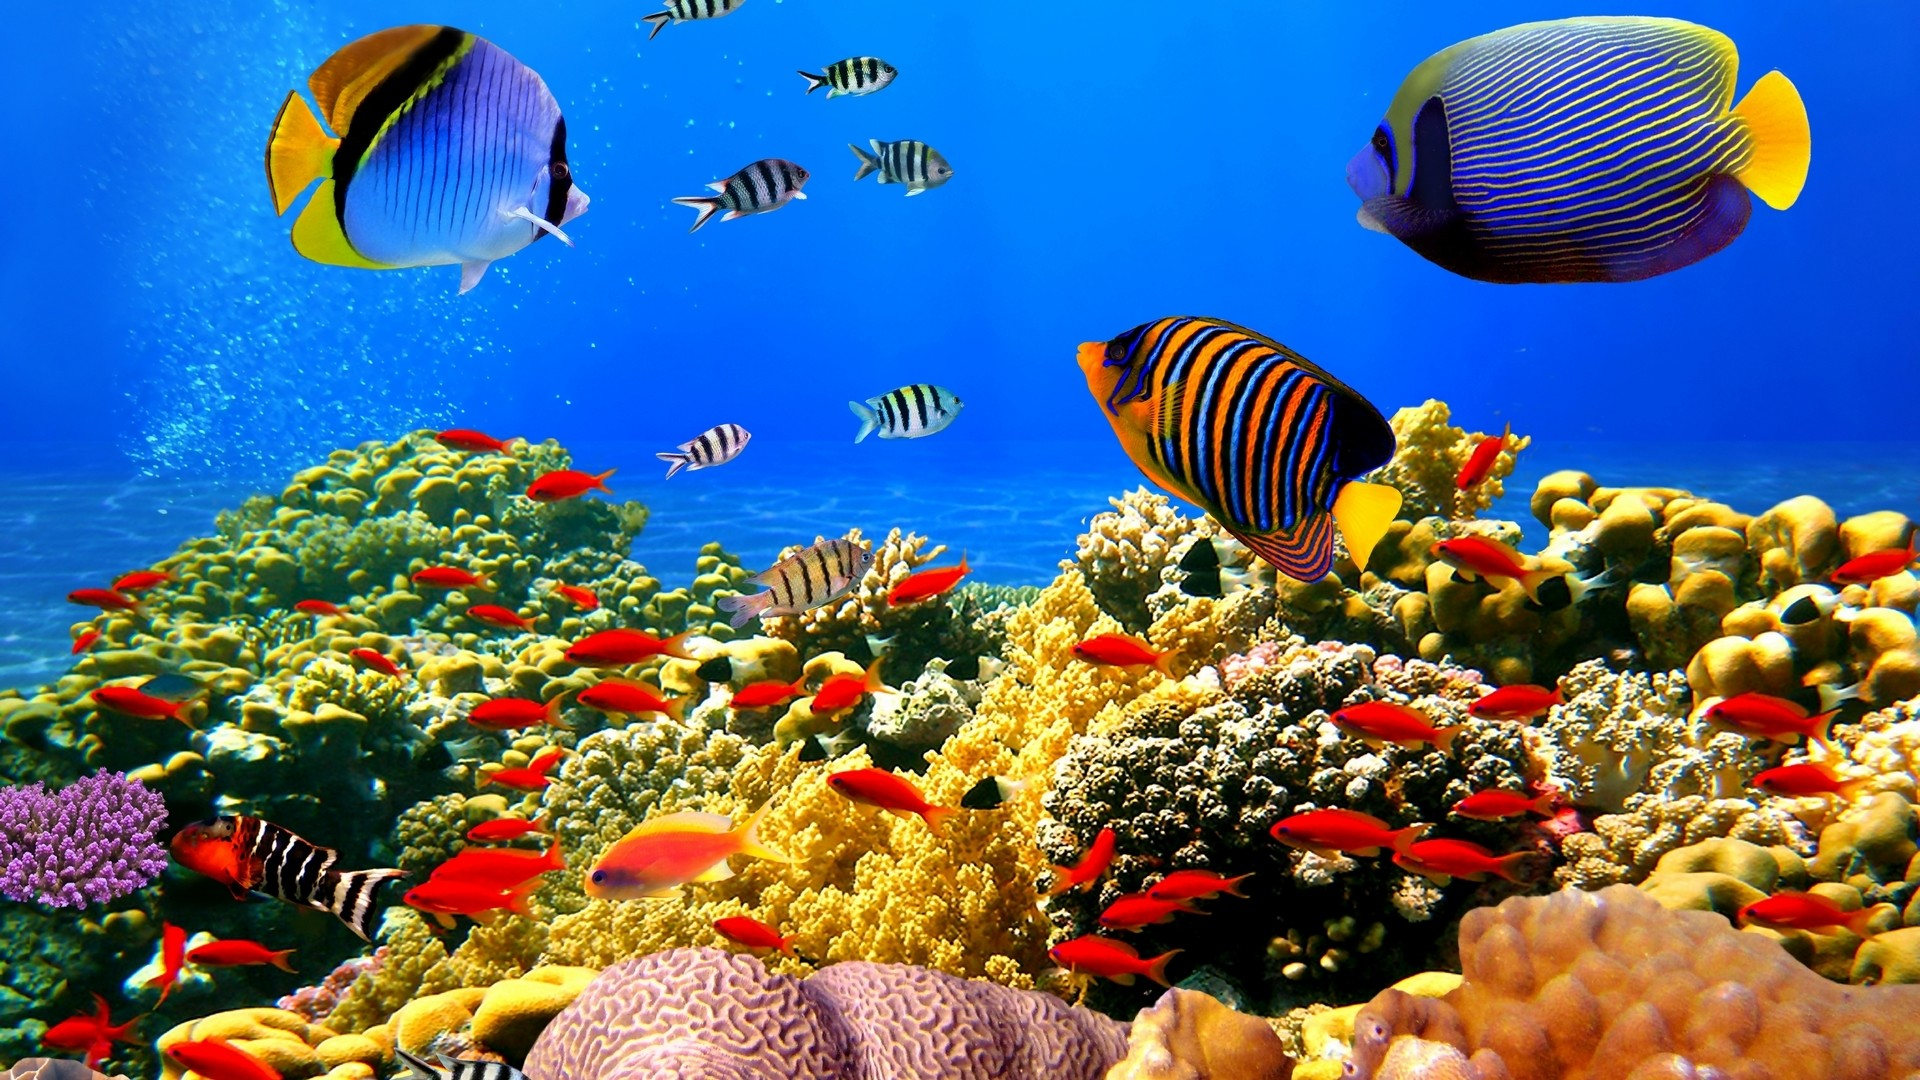 Coral Reef PC Wallpaper HD